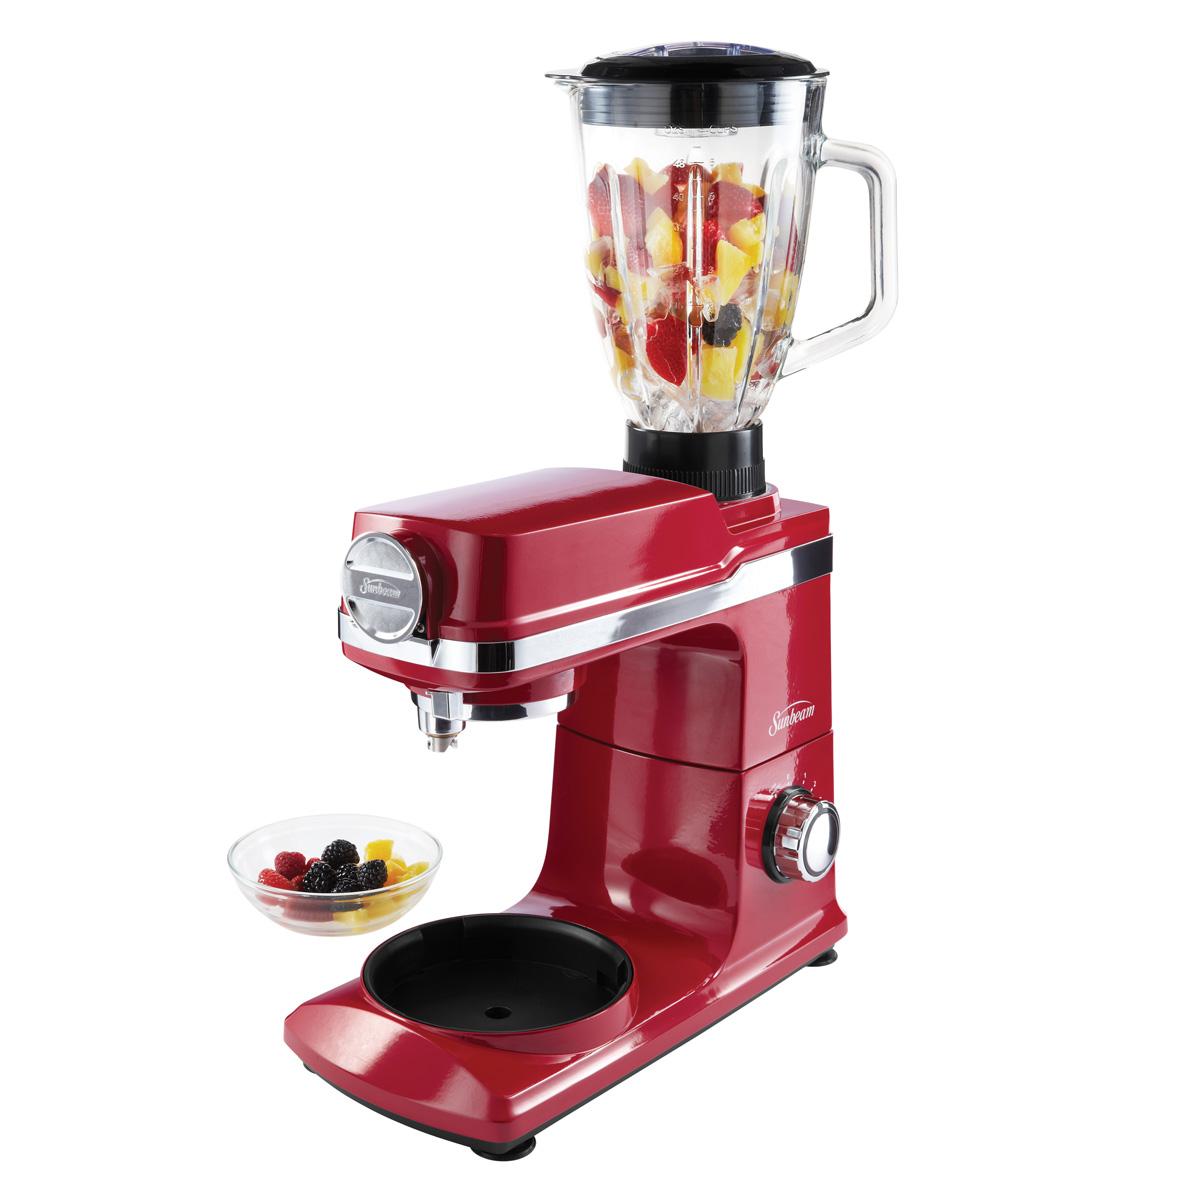 Sunbeam Coffee Maker Red : Sunbeam Mixmaster Planetary Stand Mixer, Red FPSBSM3481R-033 Sunbeam Canada